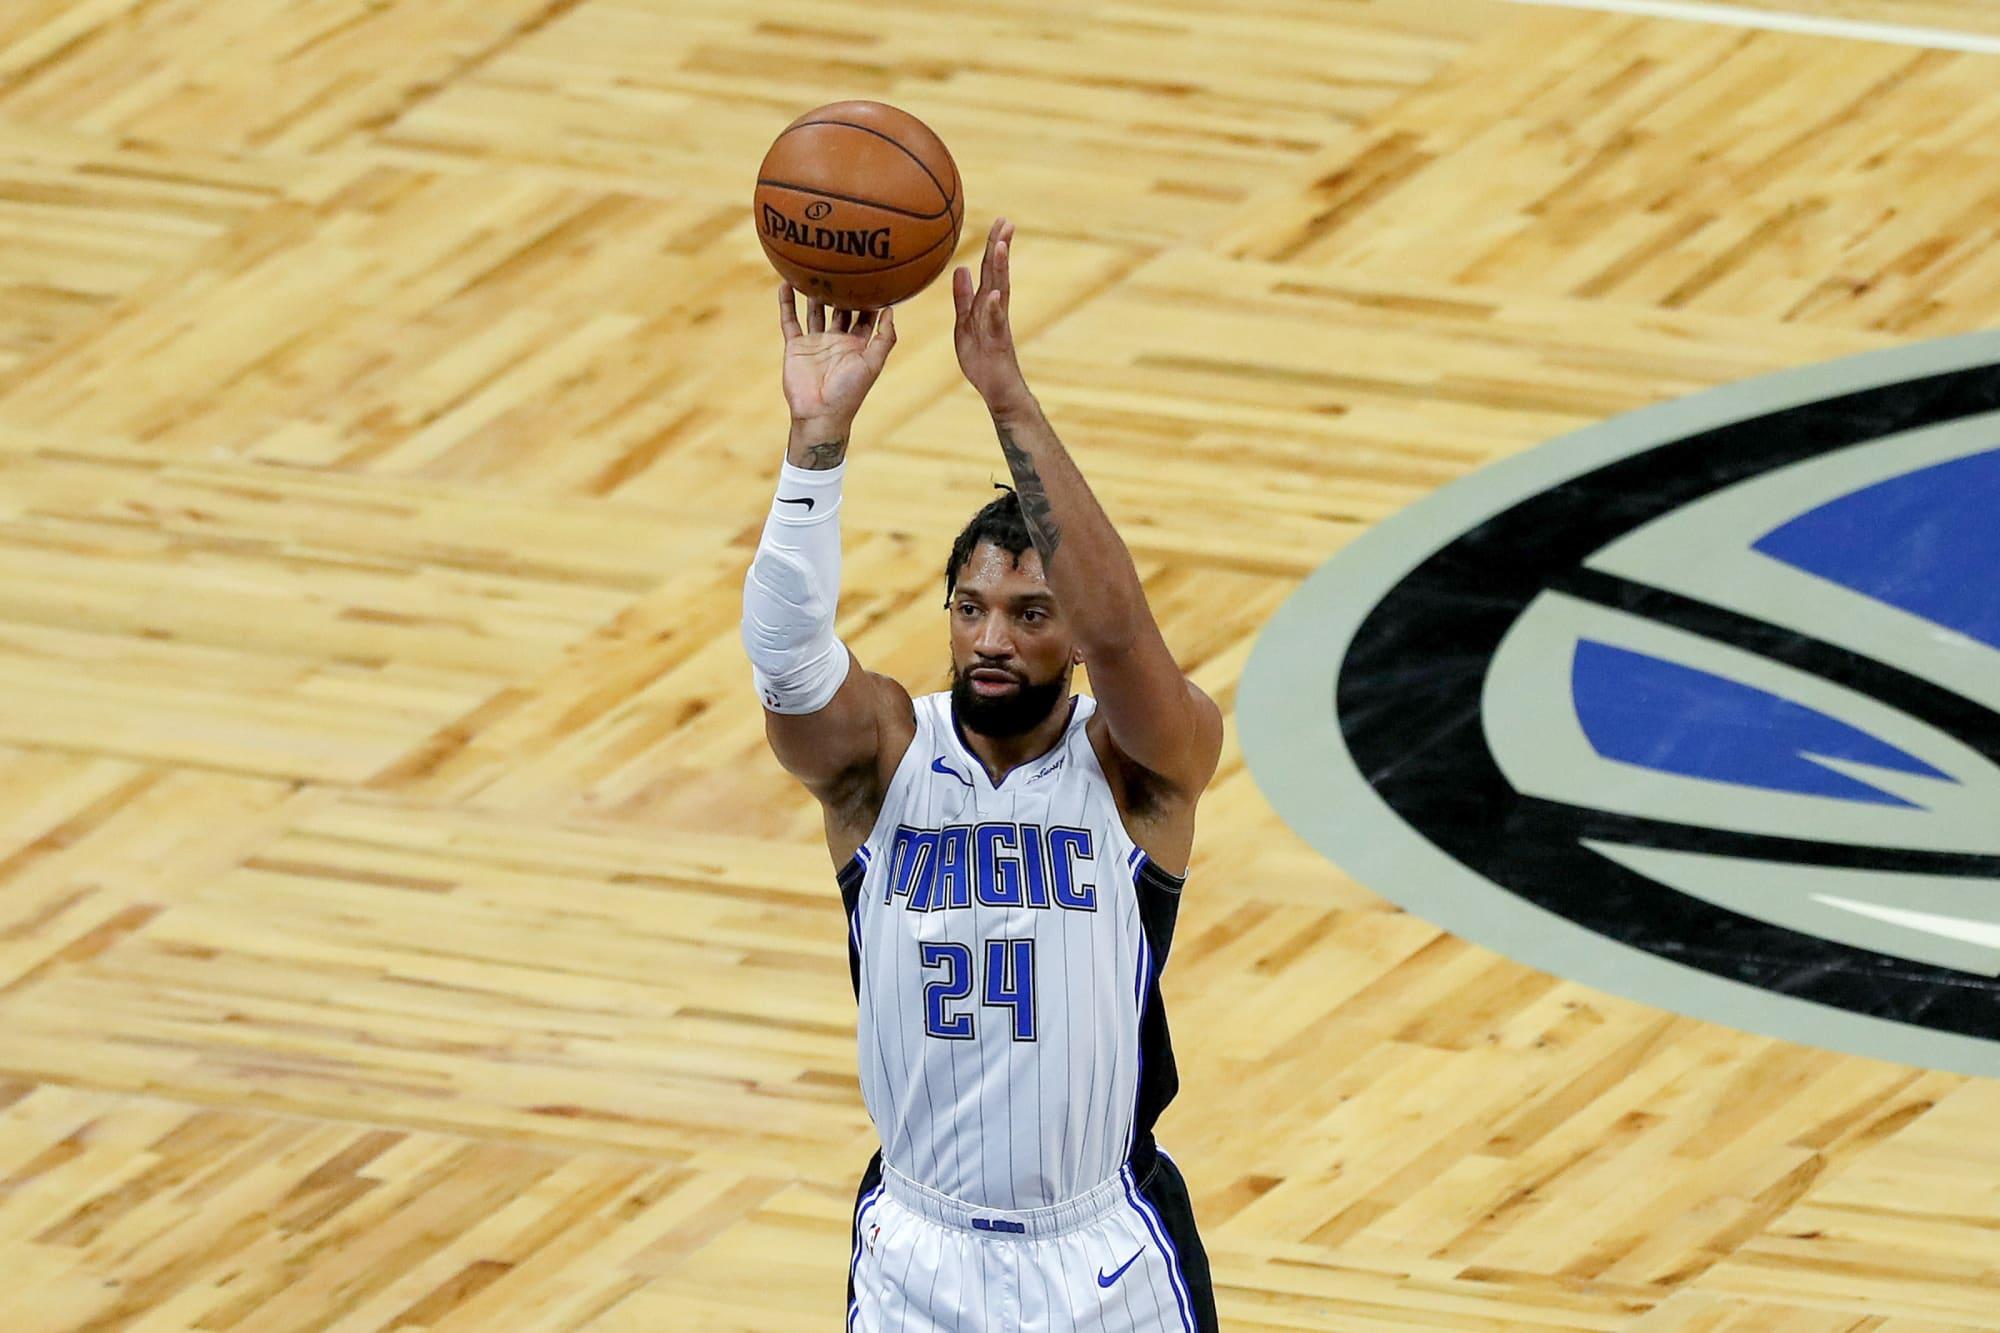 Toronto Raptors: Khem Birch likely headed to Toronto as Magic plan to waive him